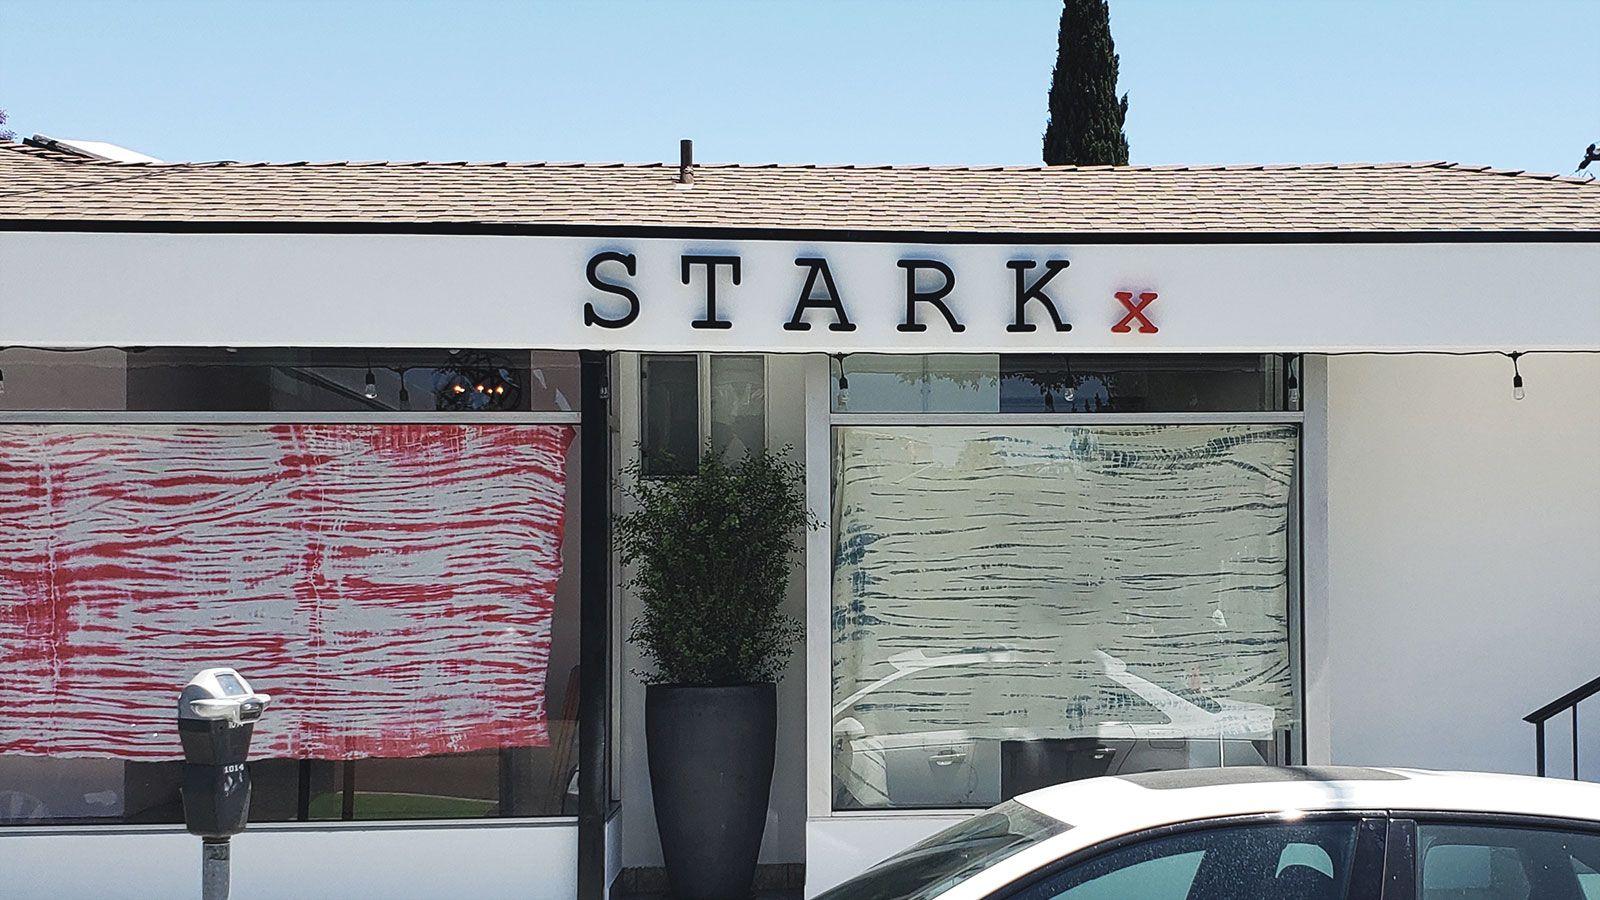 Stark aluminum 3d letters